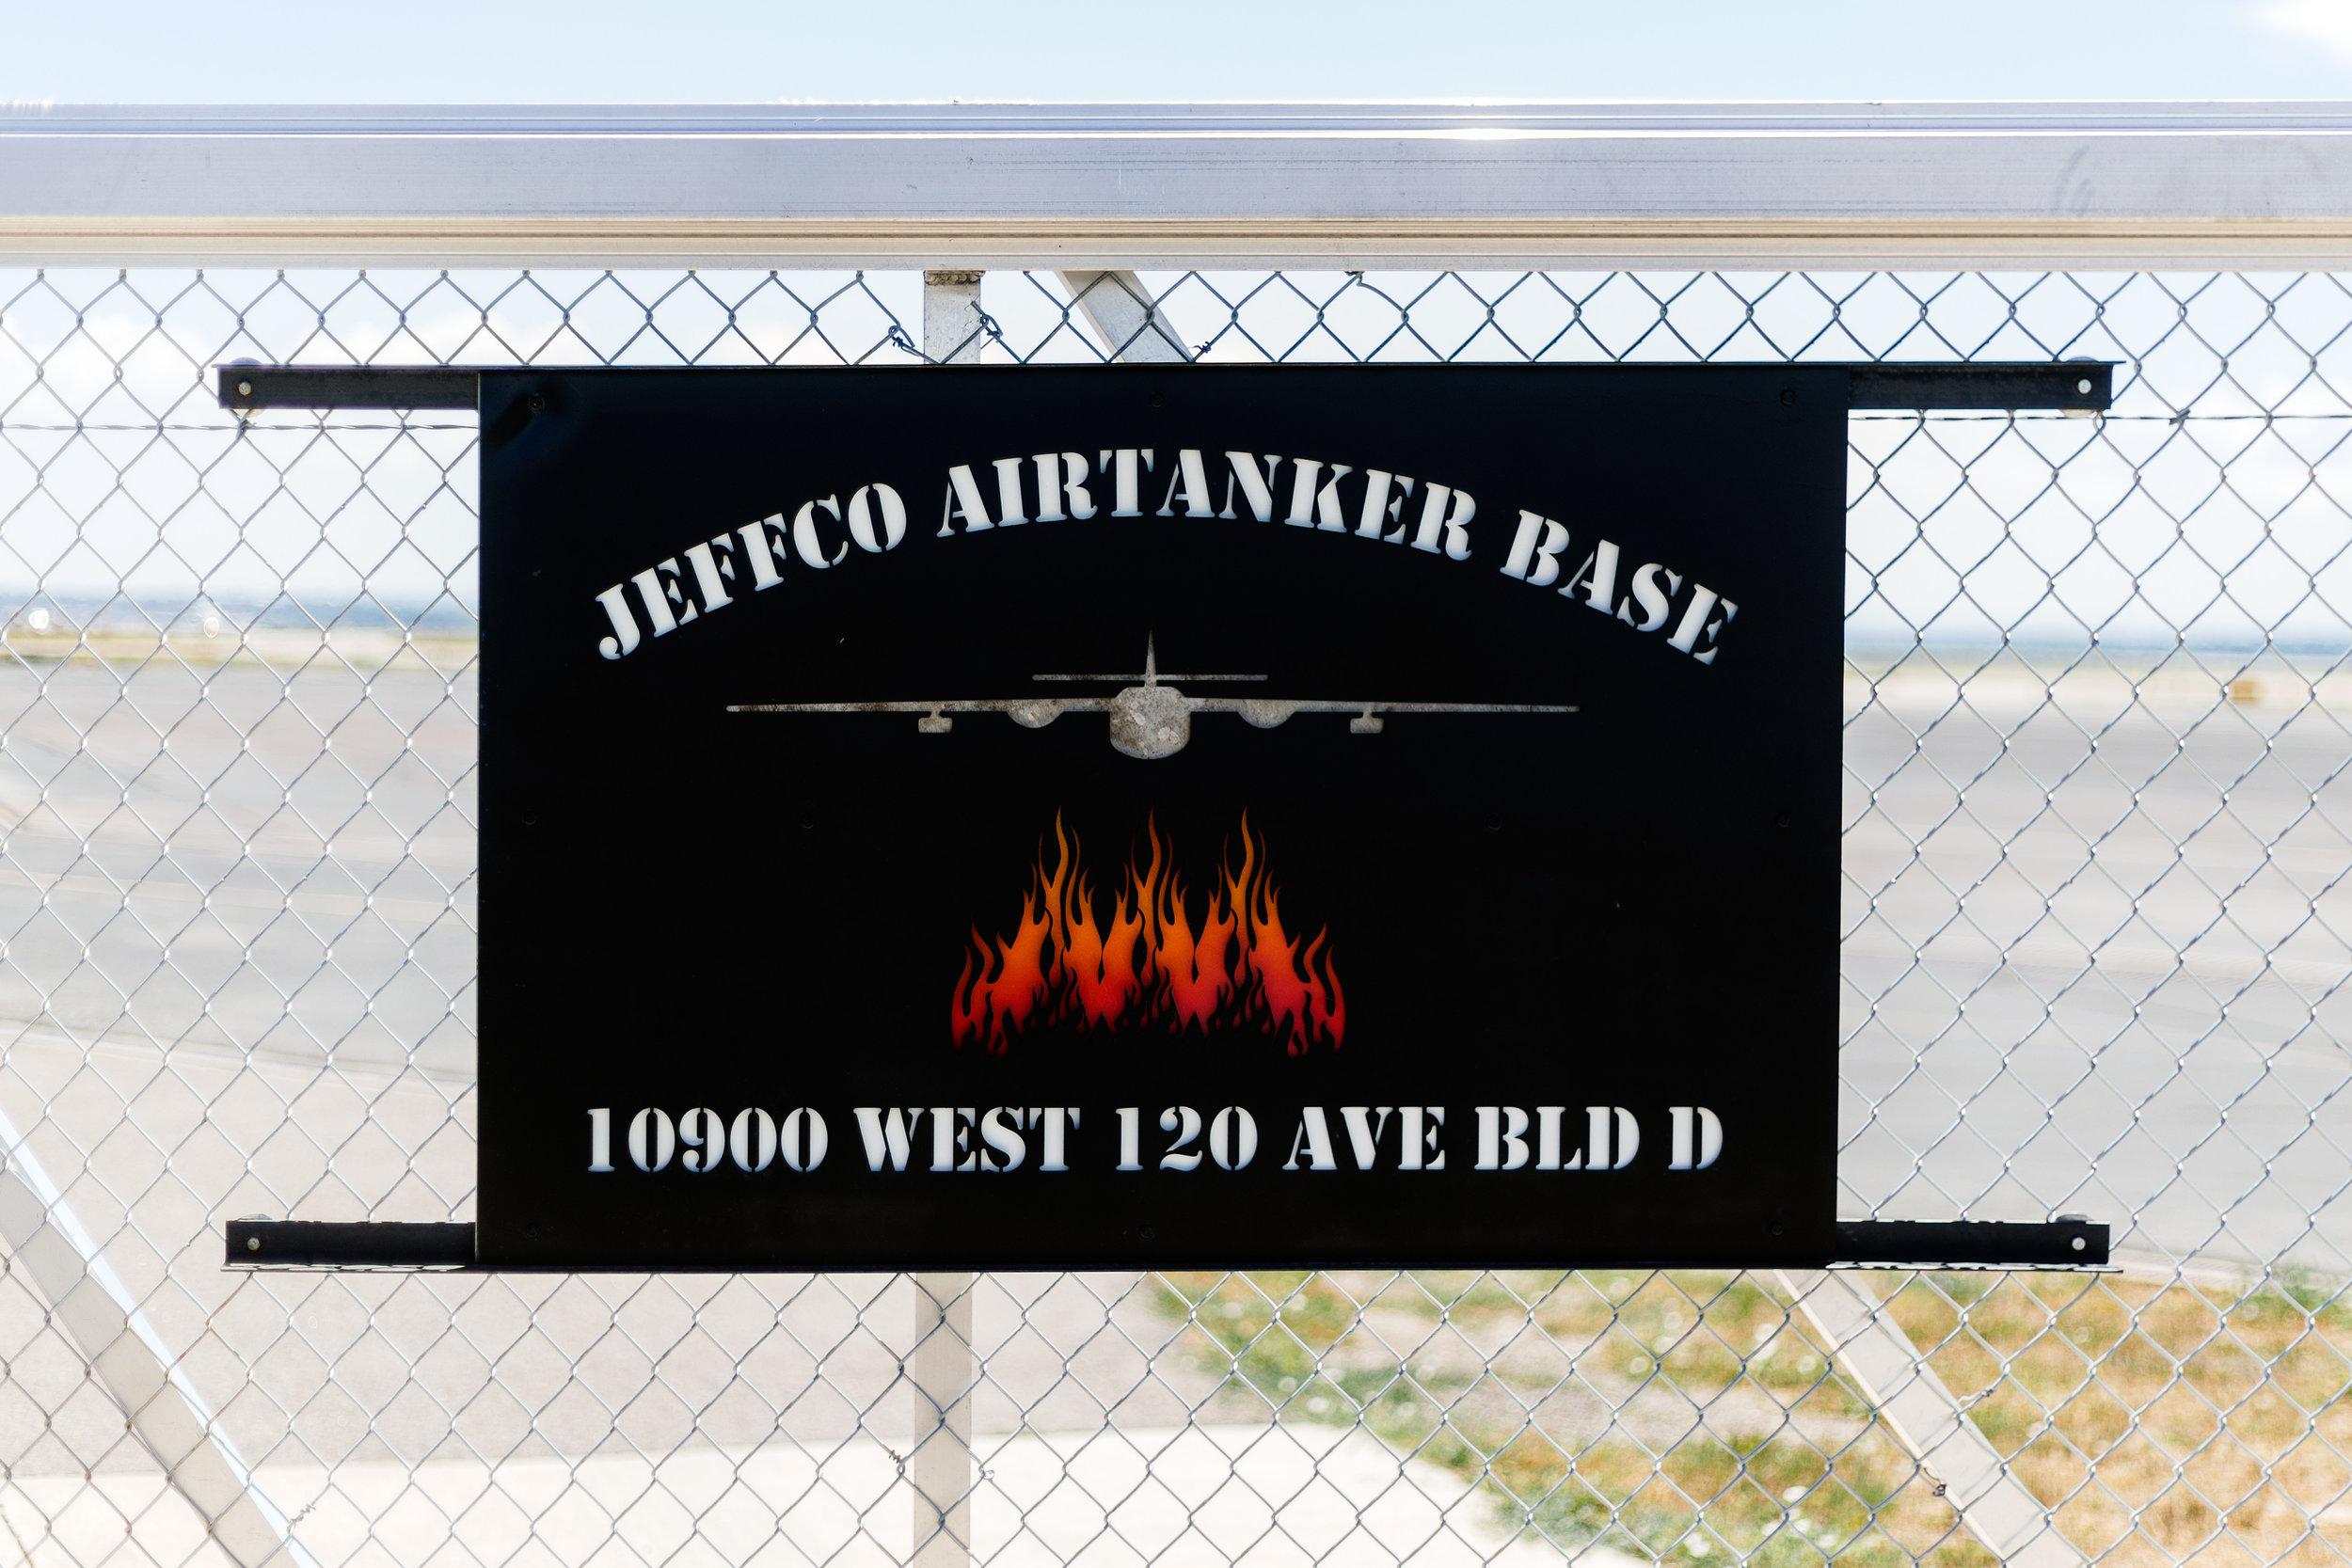 Jeffco Airtanker Base.jpg